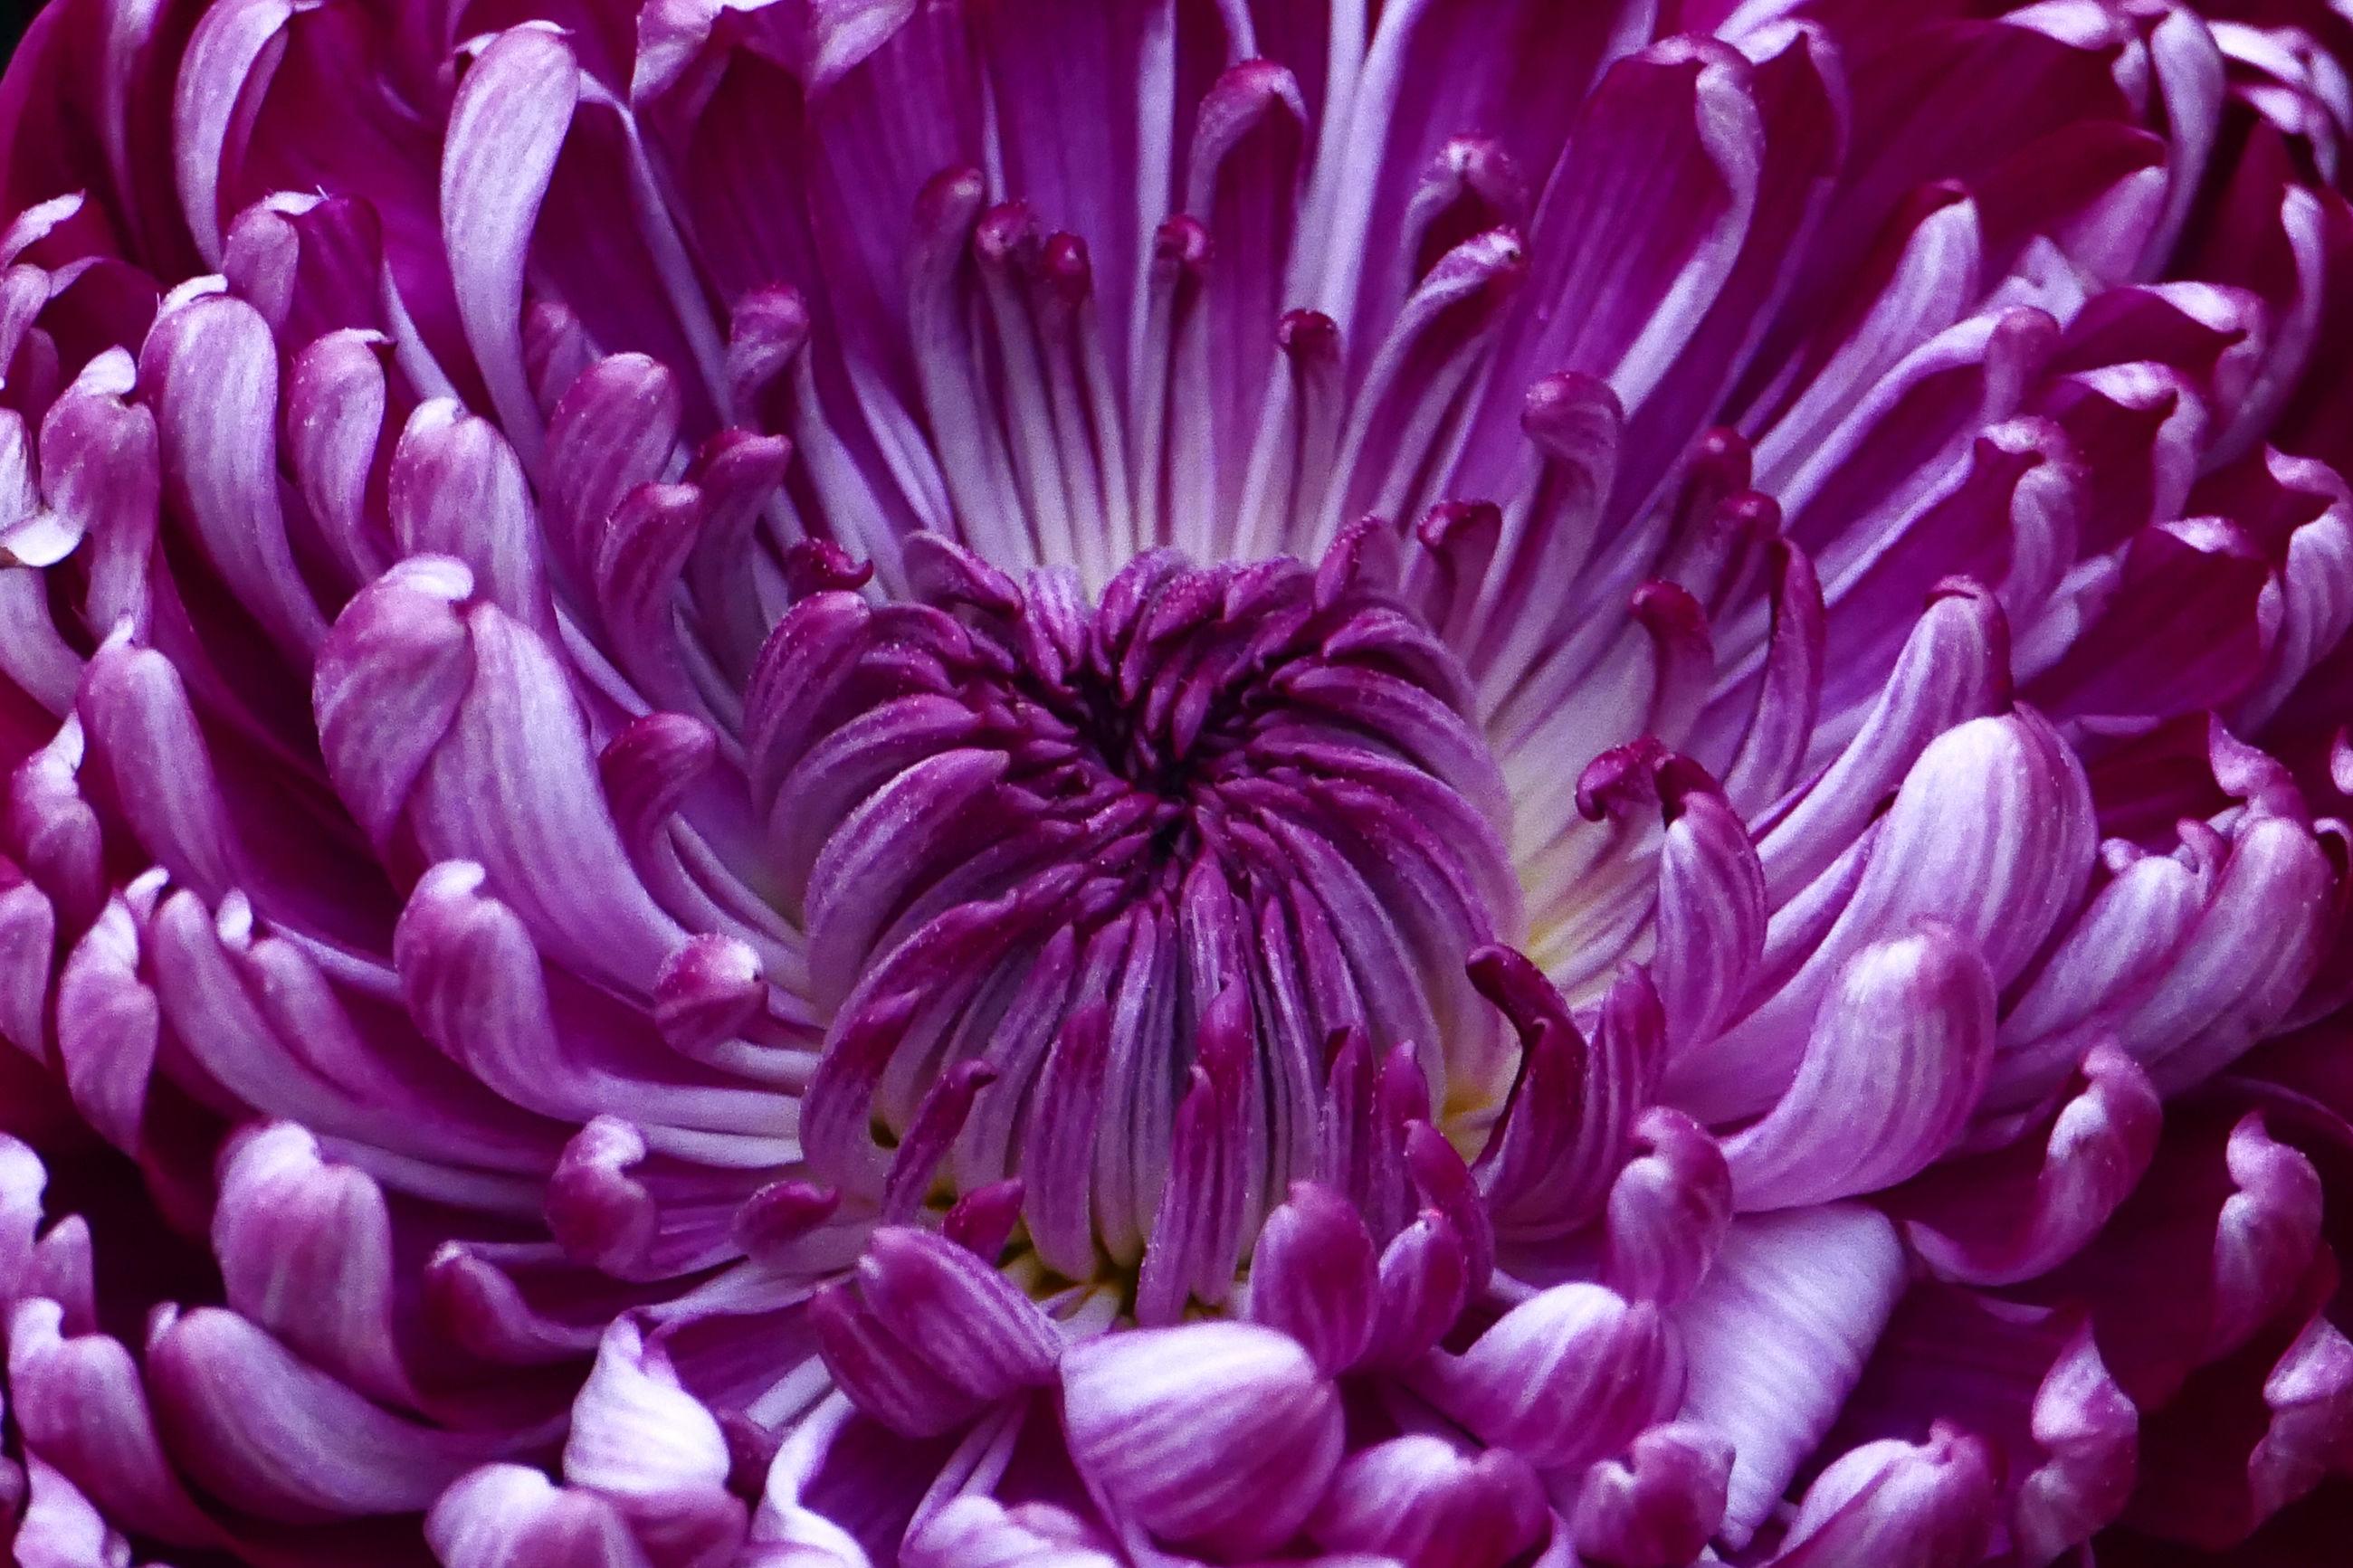 Close-up of purple dahlia